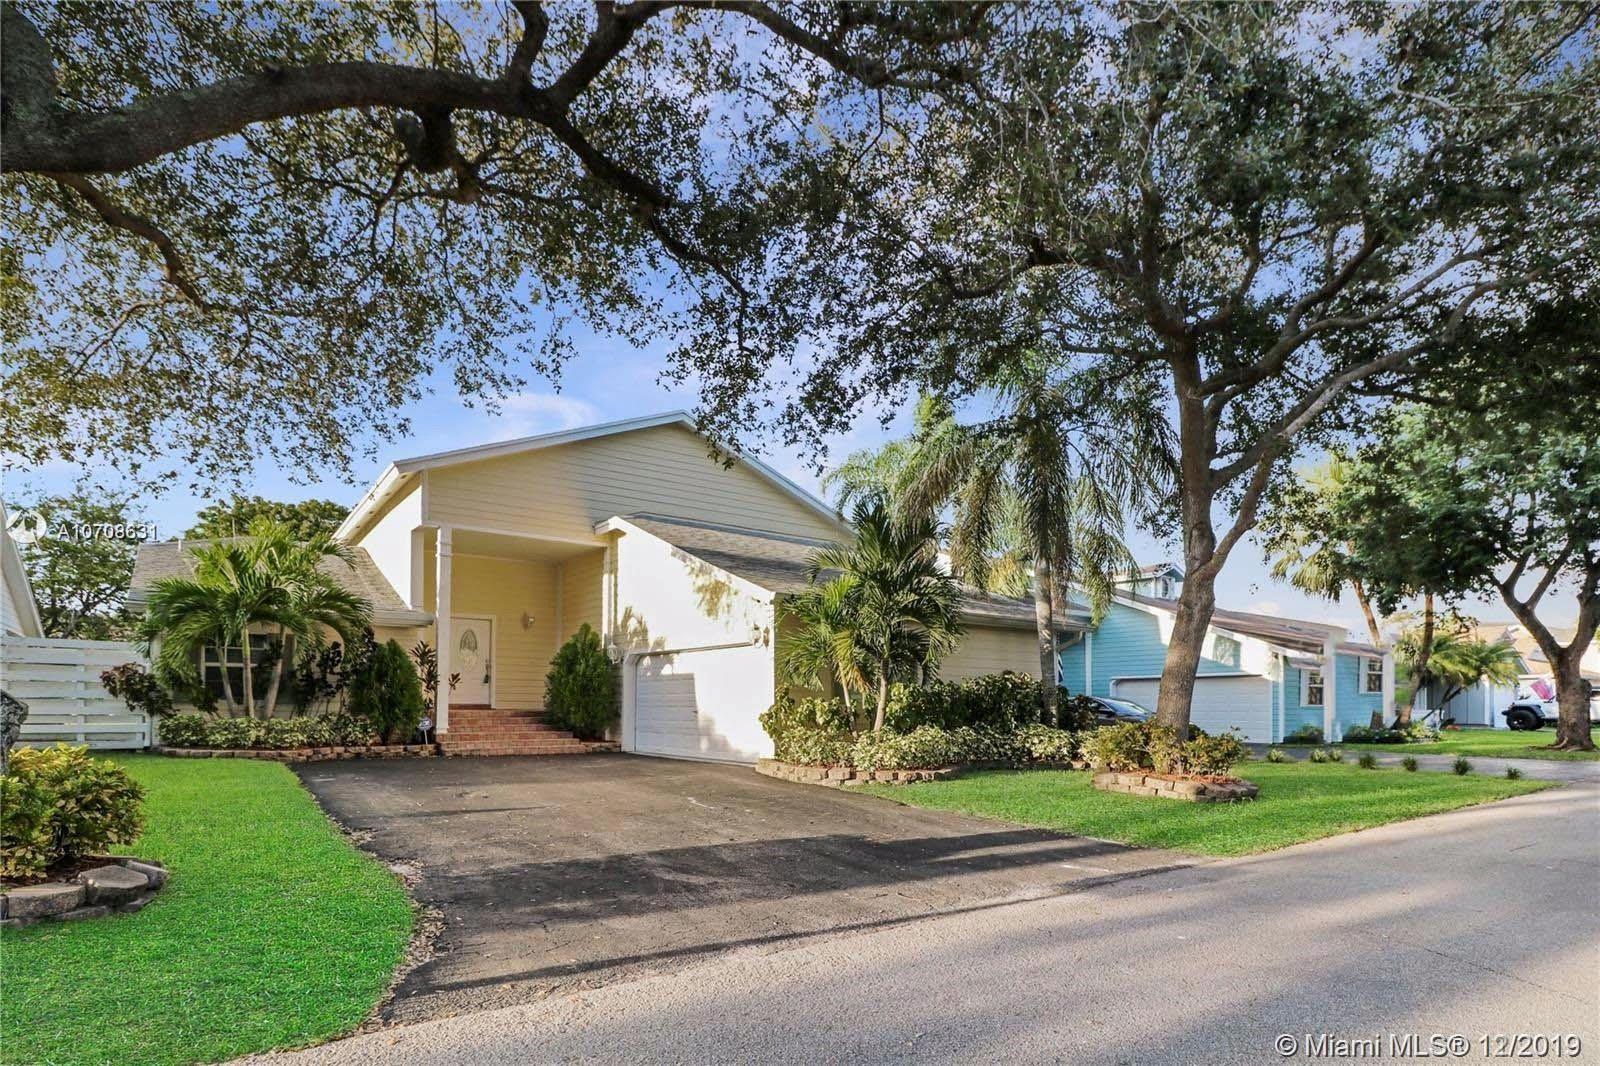 14033 SW 149th Ln, Miami, FL 33186 - MLS#: A10708631